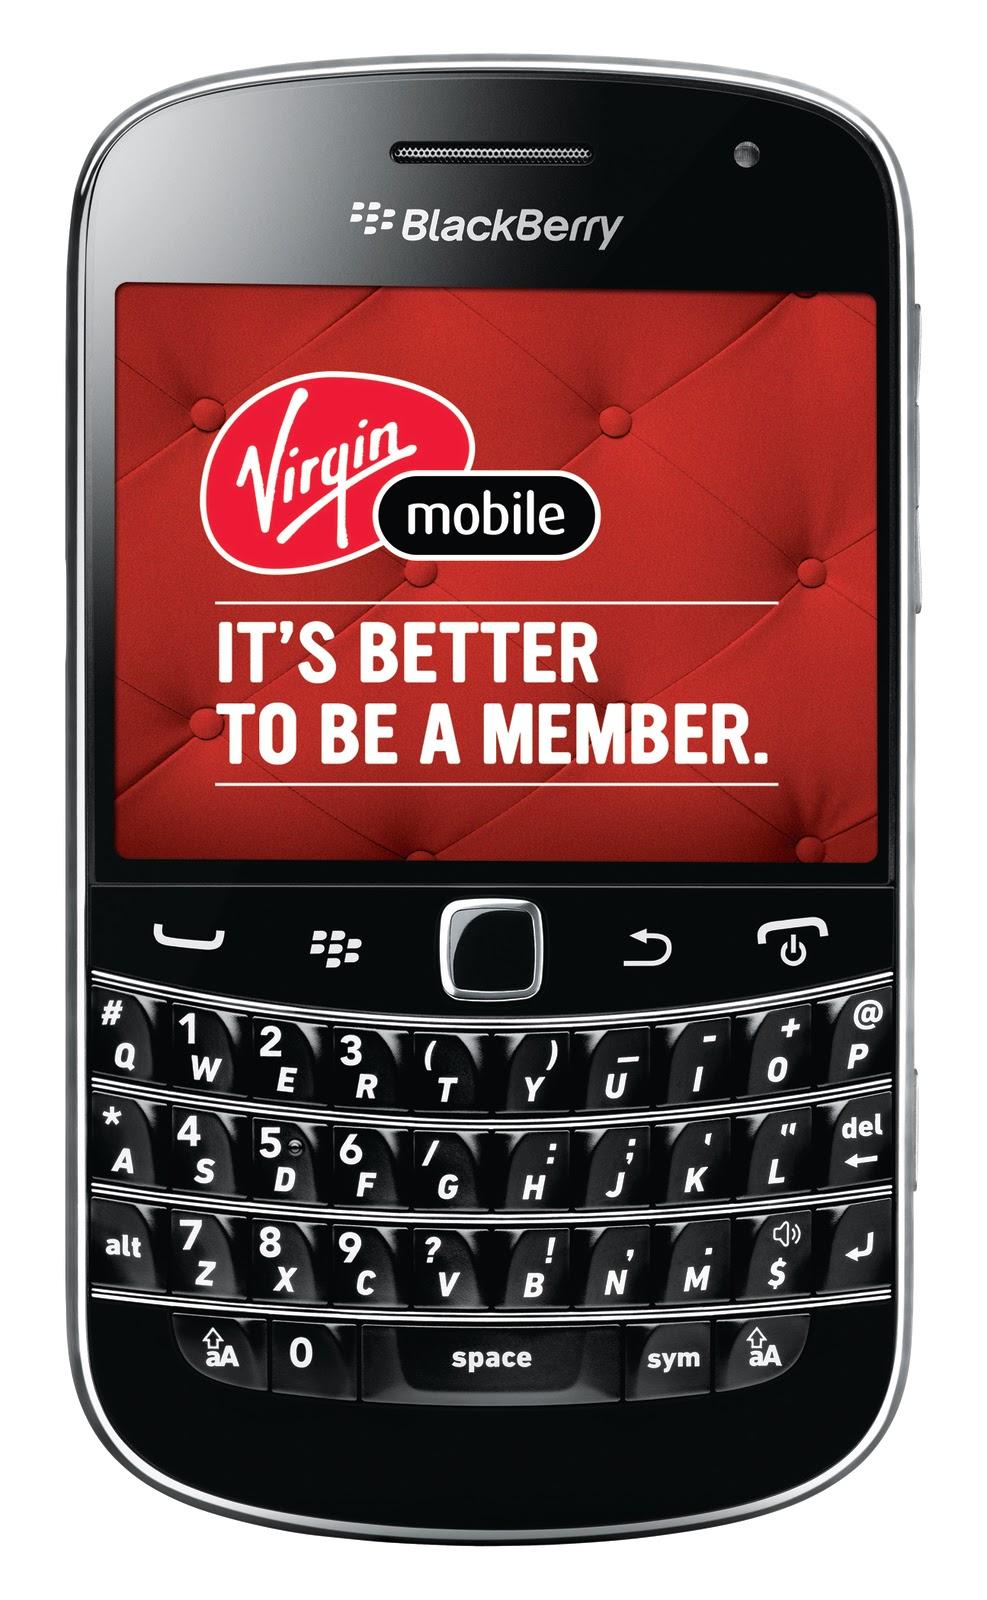 Amusing Virgin mobile bc